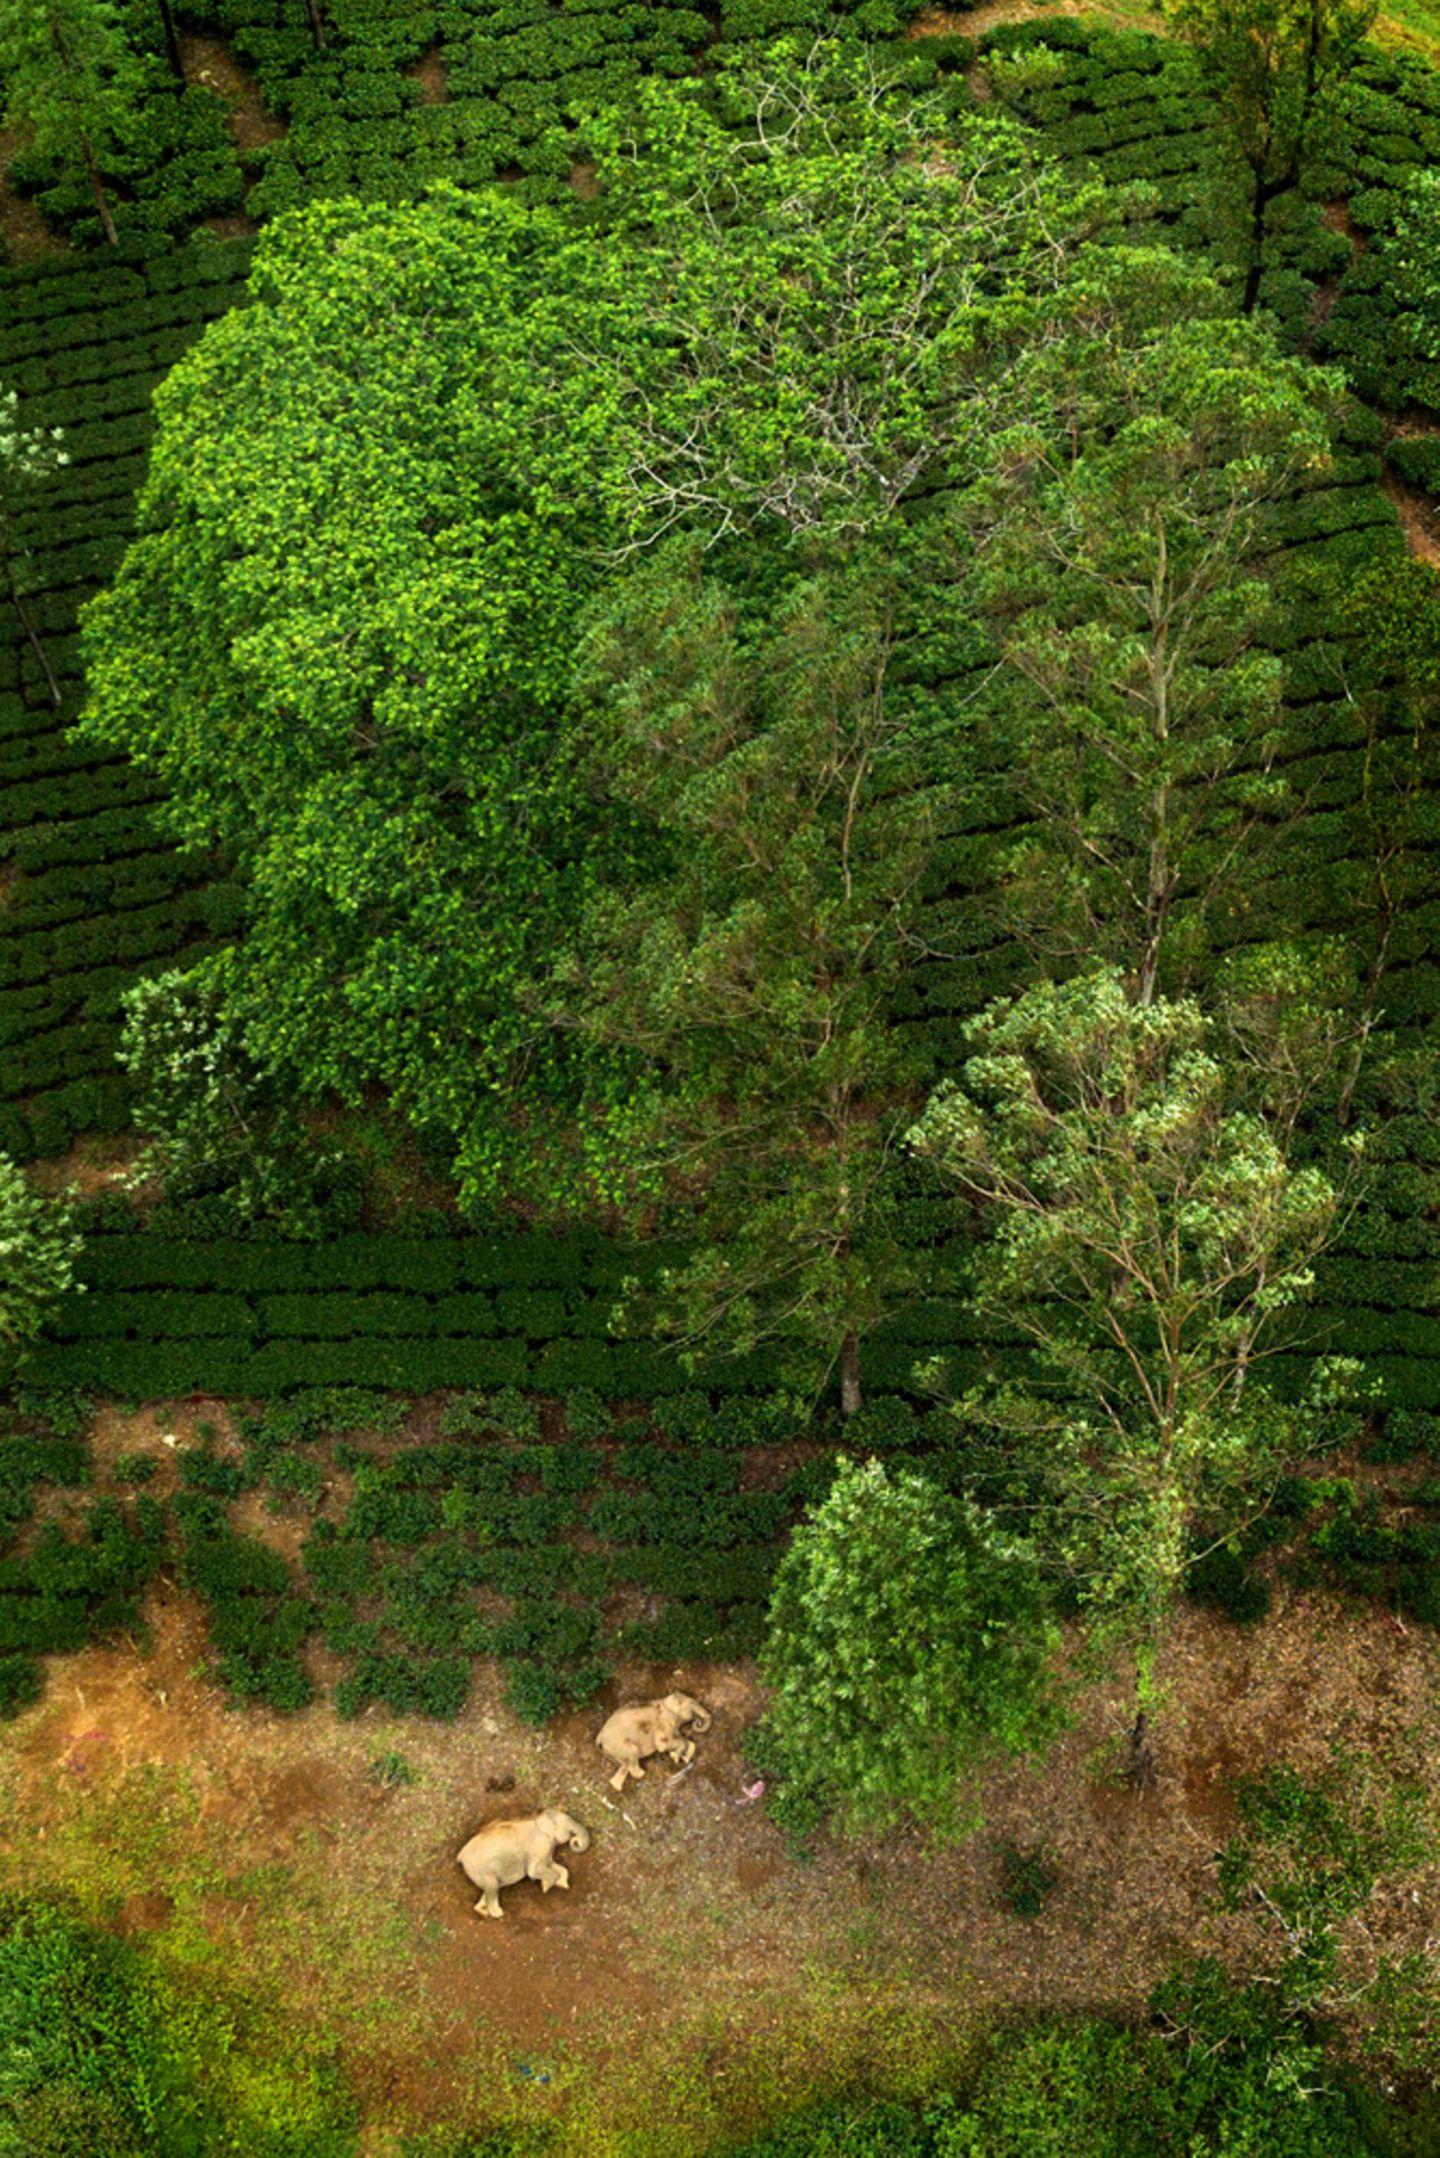 Ganesh Raghunathan/Nature inFocus Photograph of the Year